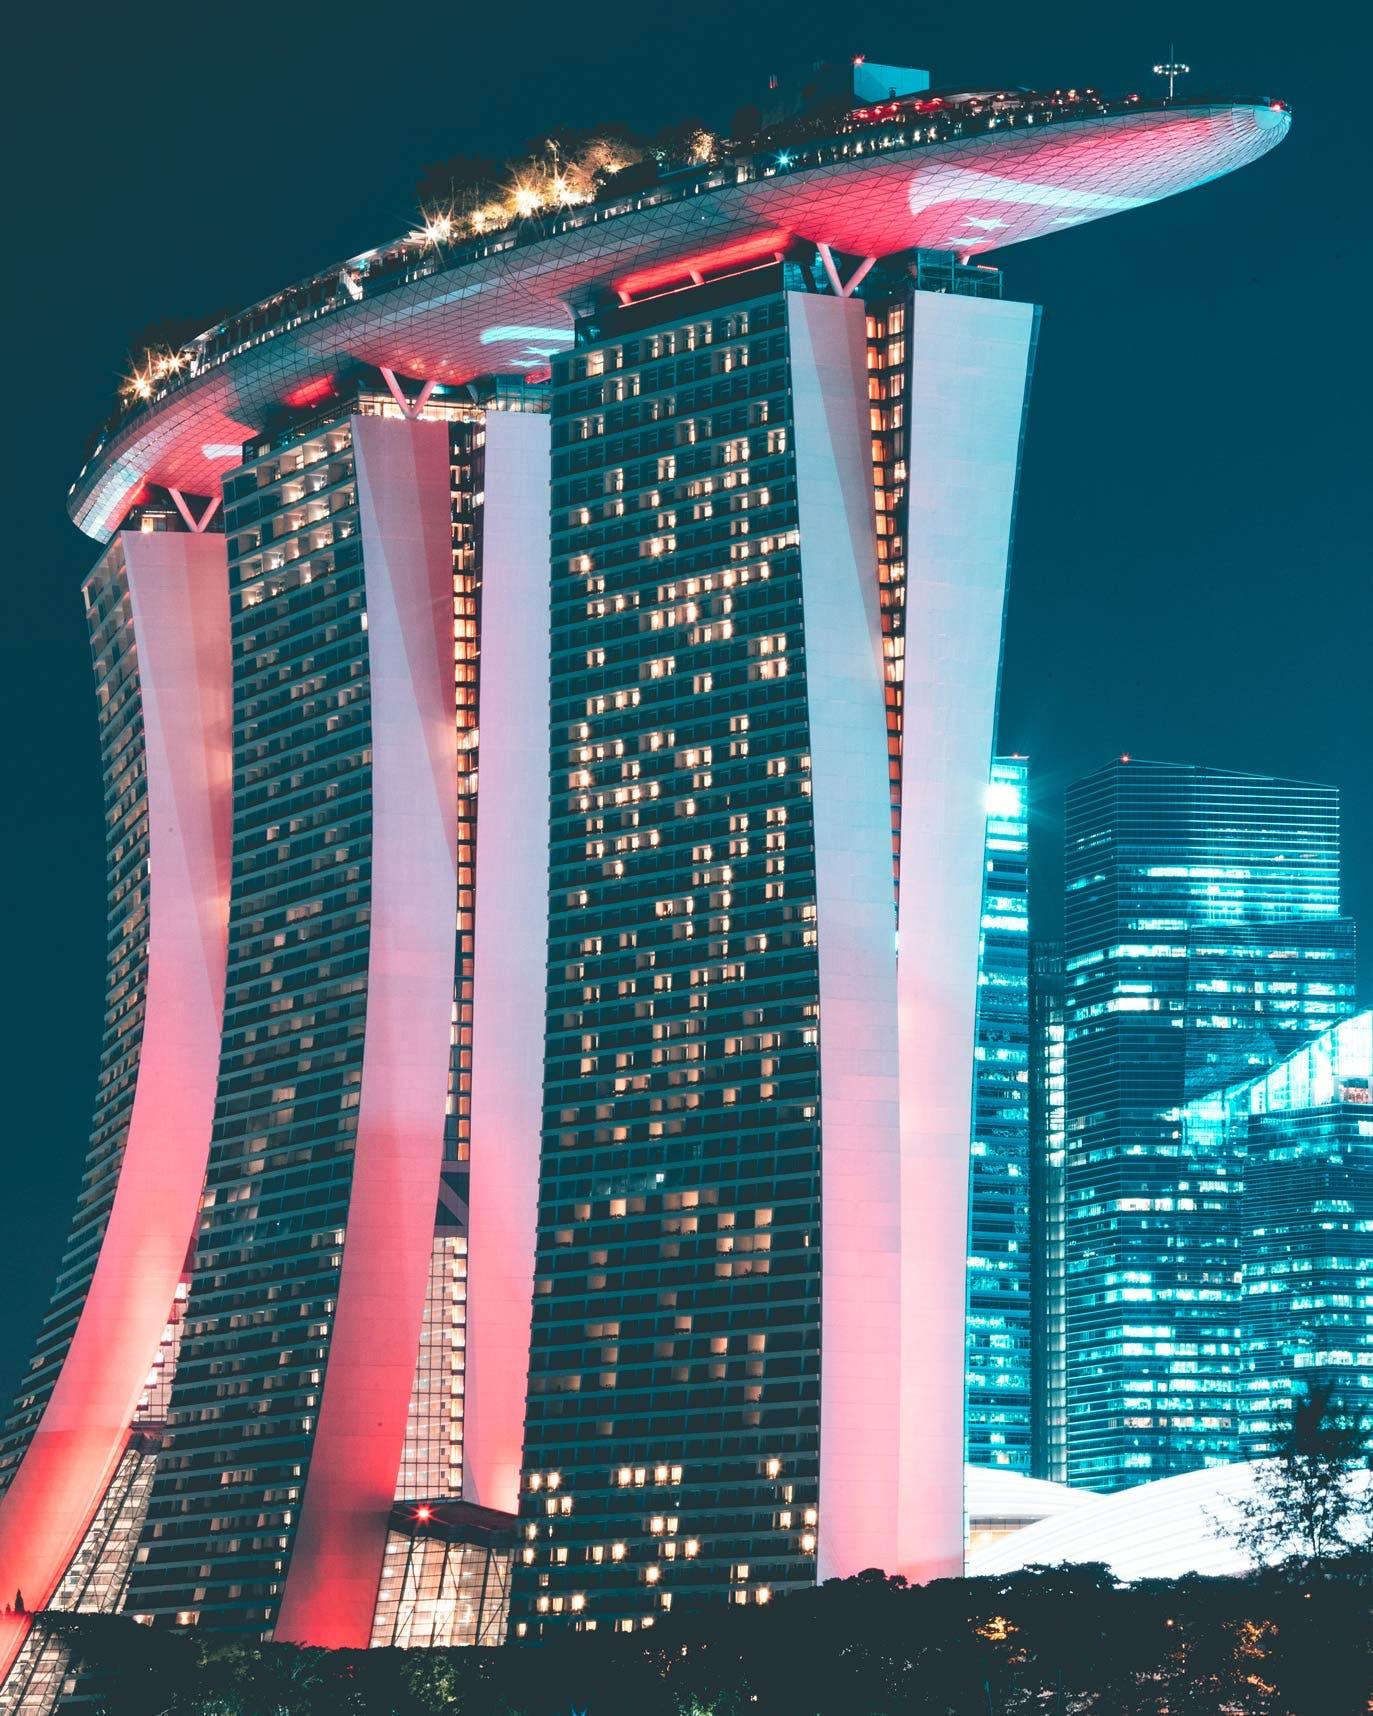 Most Instagrammable Spots in Singapore/@yk